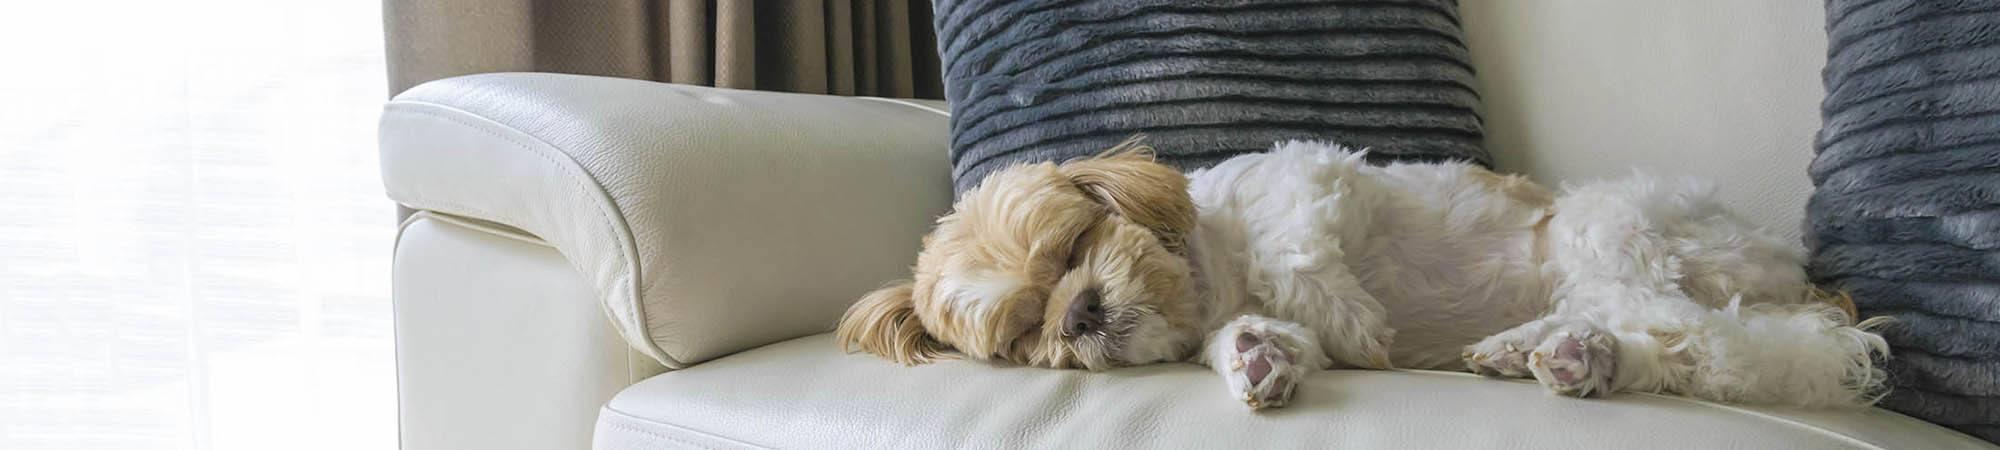 Pet friendly apartments in Elkton